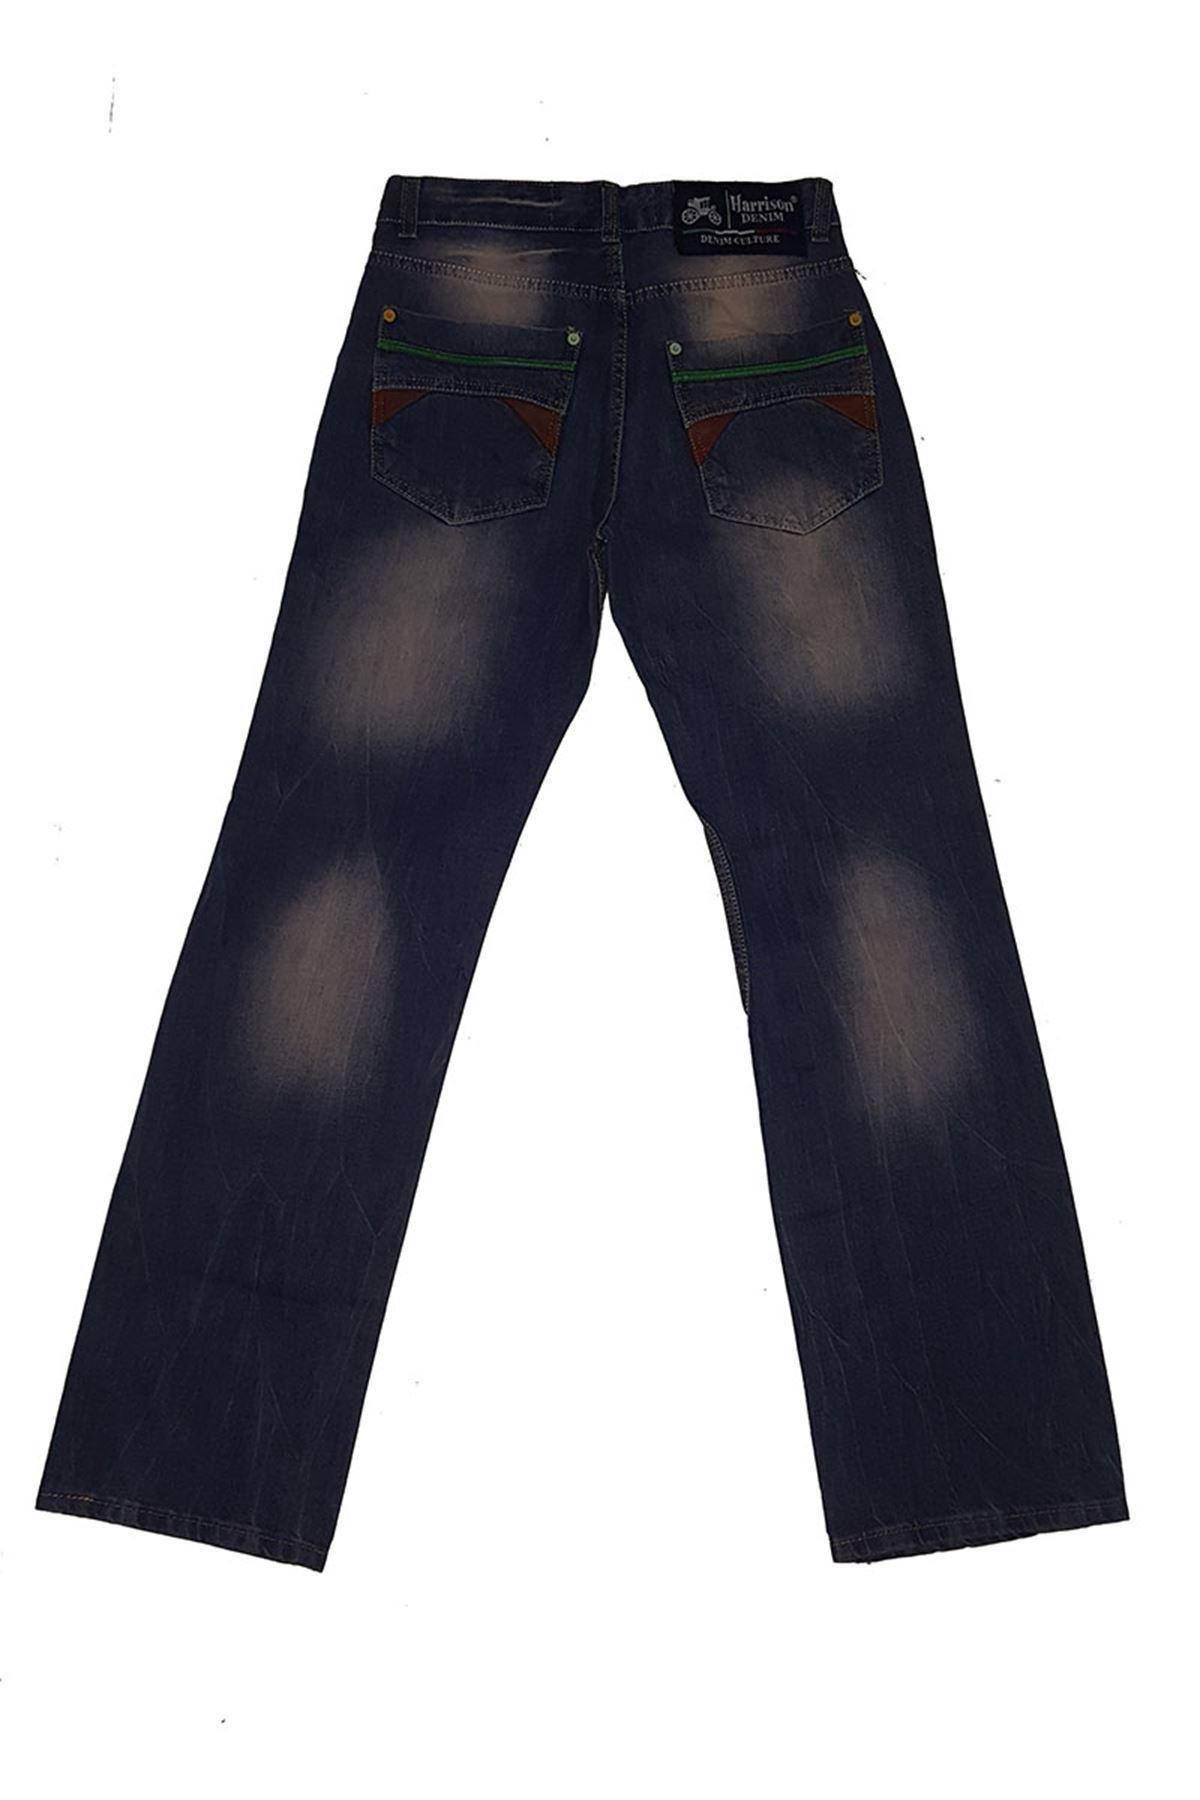 Erkek Kot Pantolon 18B-13985